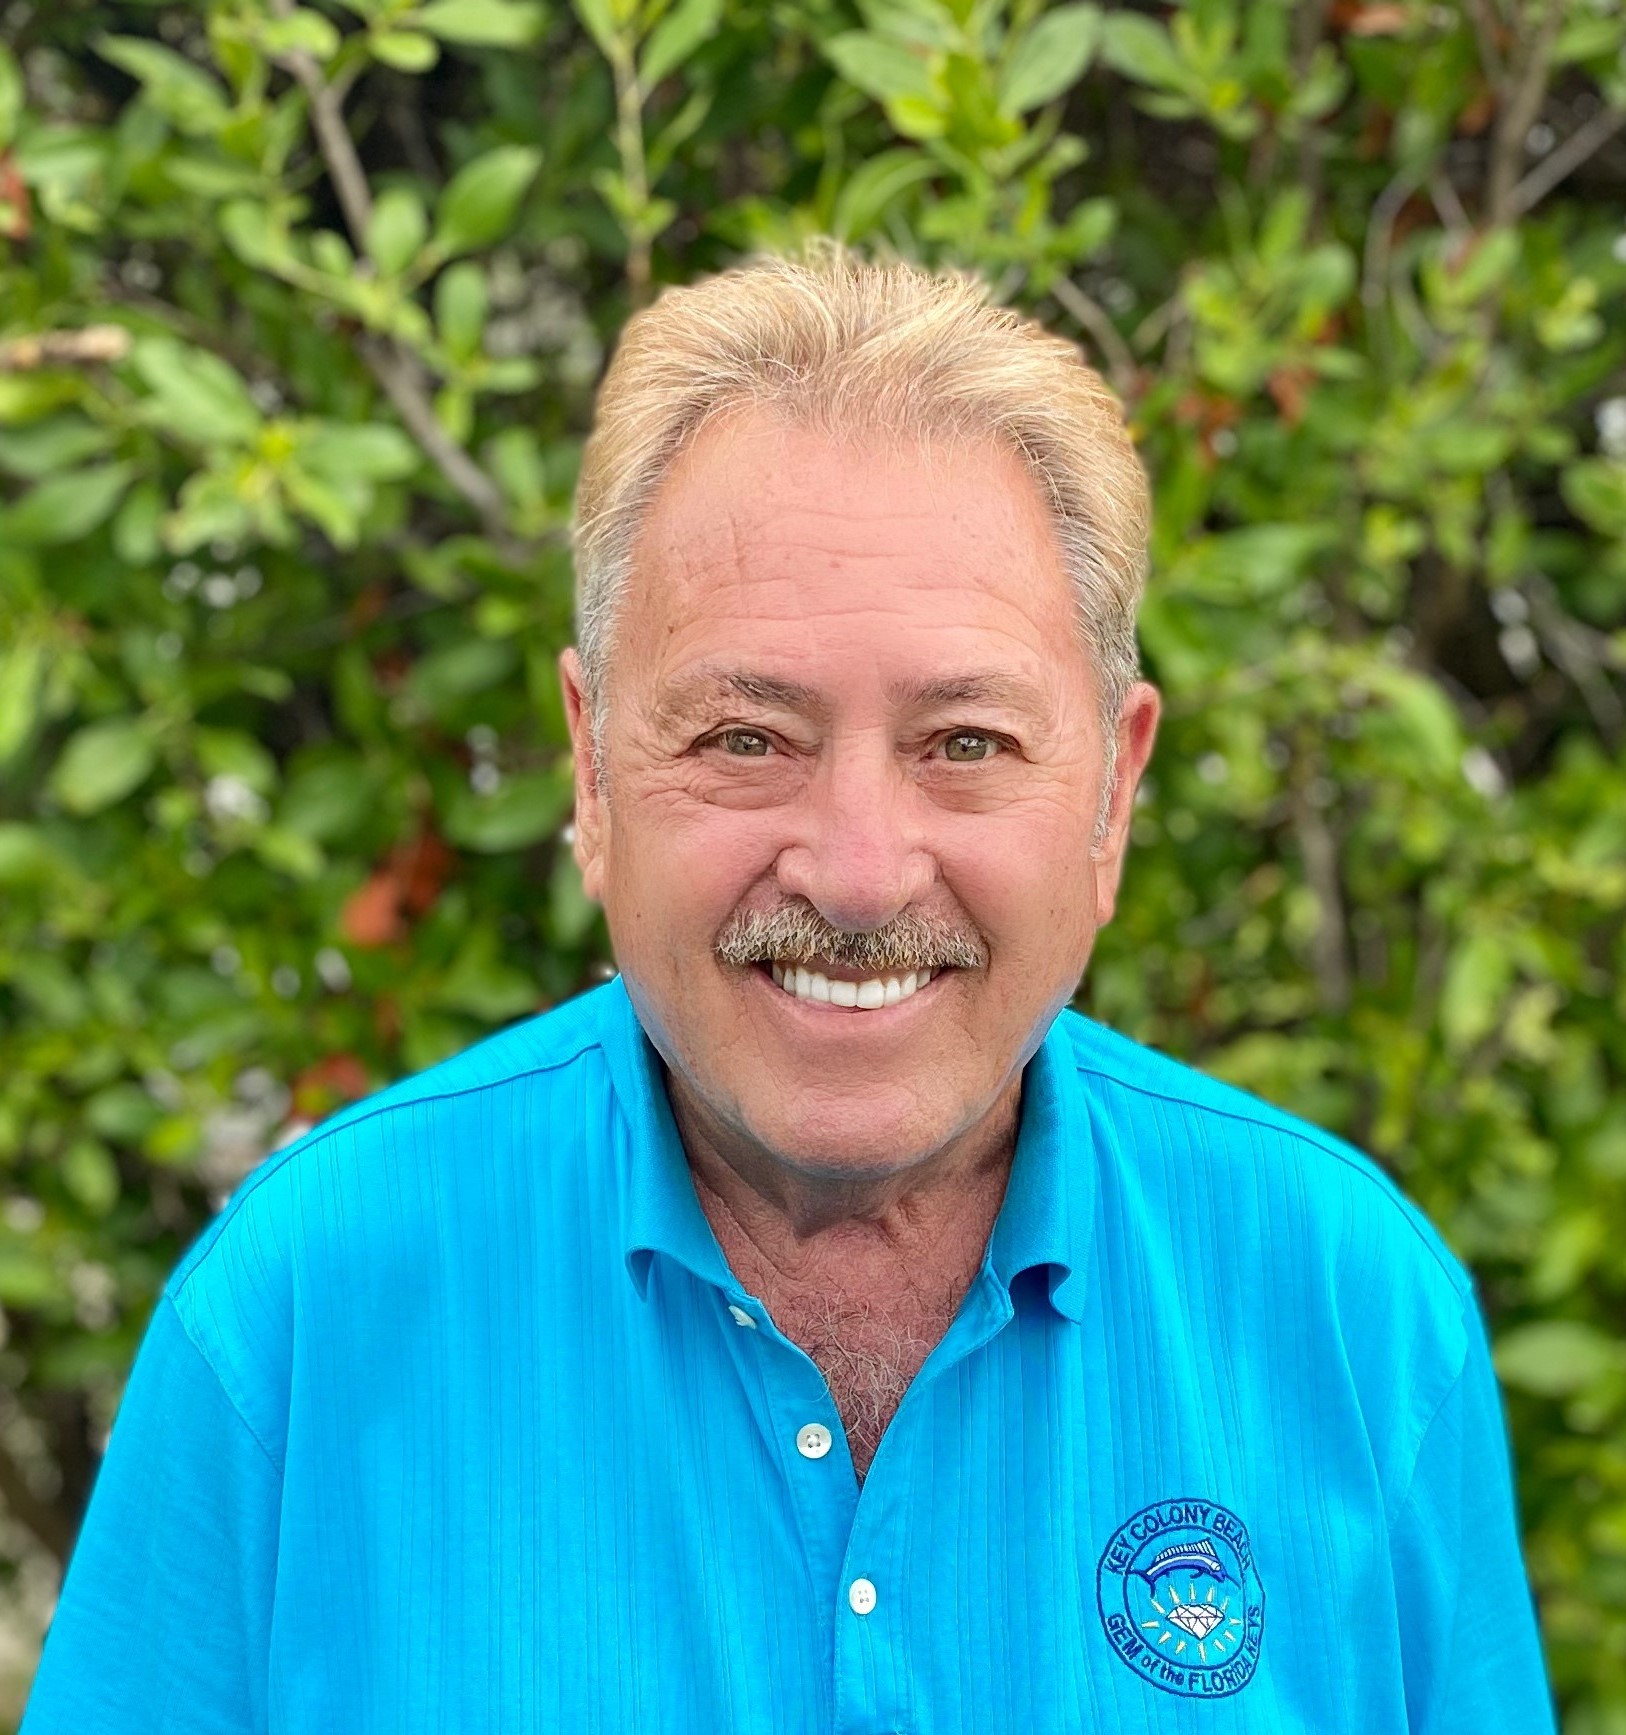 Vice Mayor Sutton